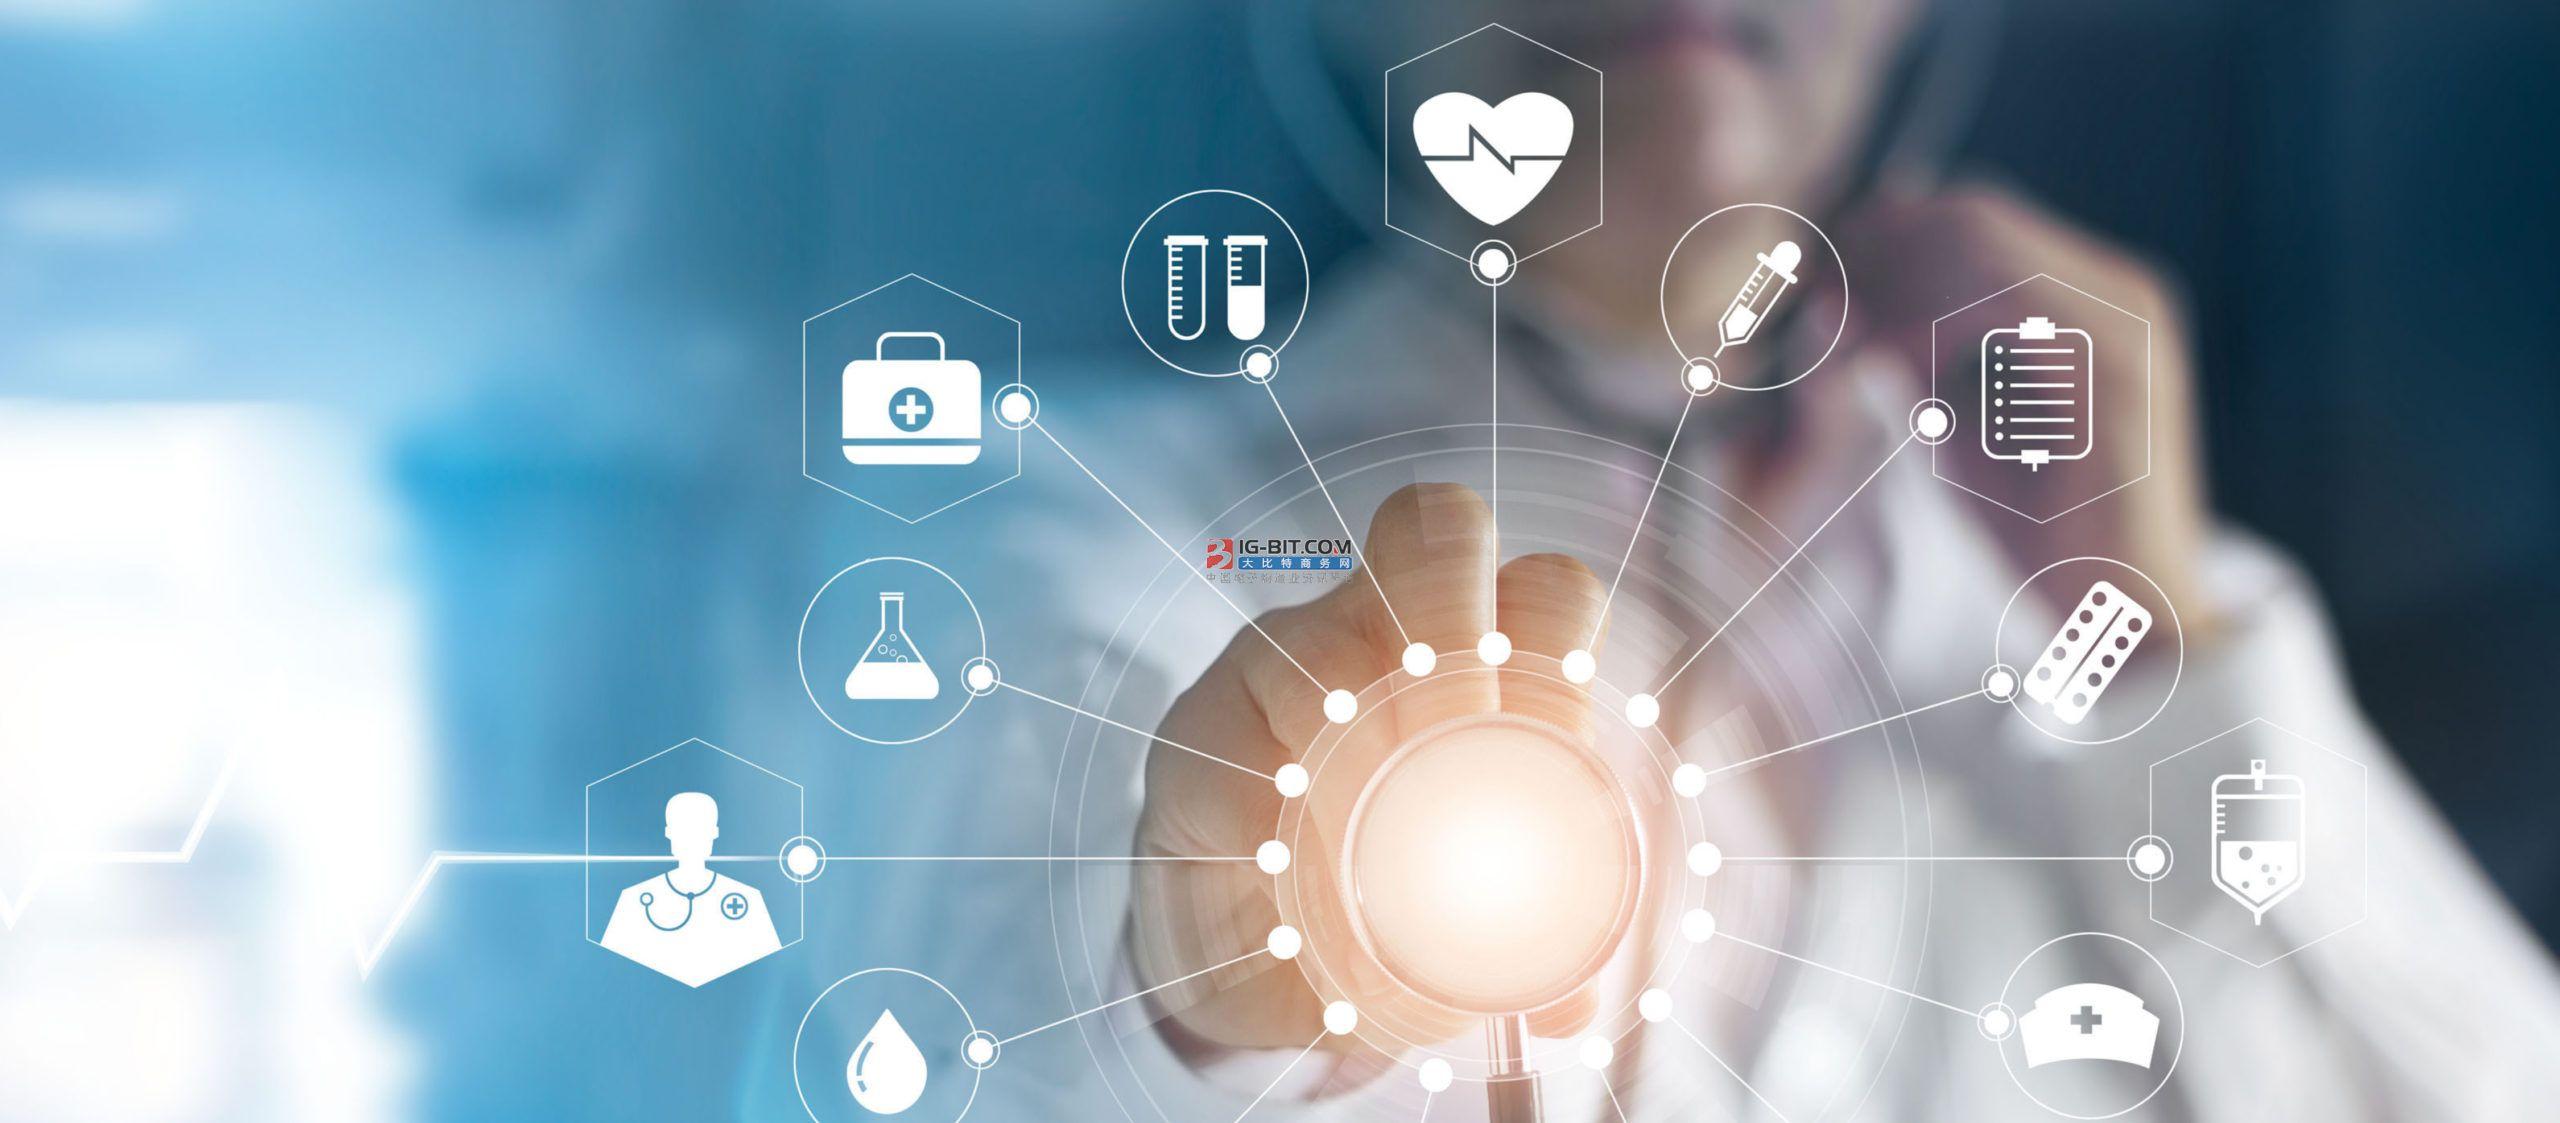 AI医疗助力医院抗疫,规模化落地仍处困局?